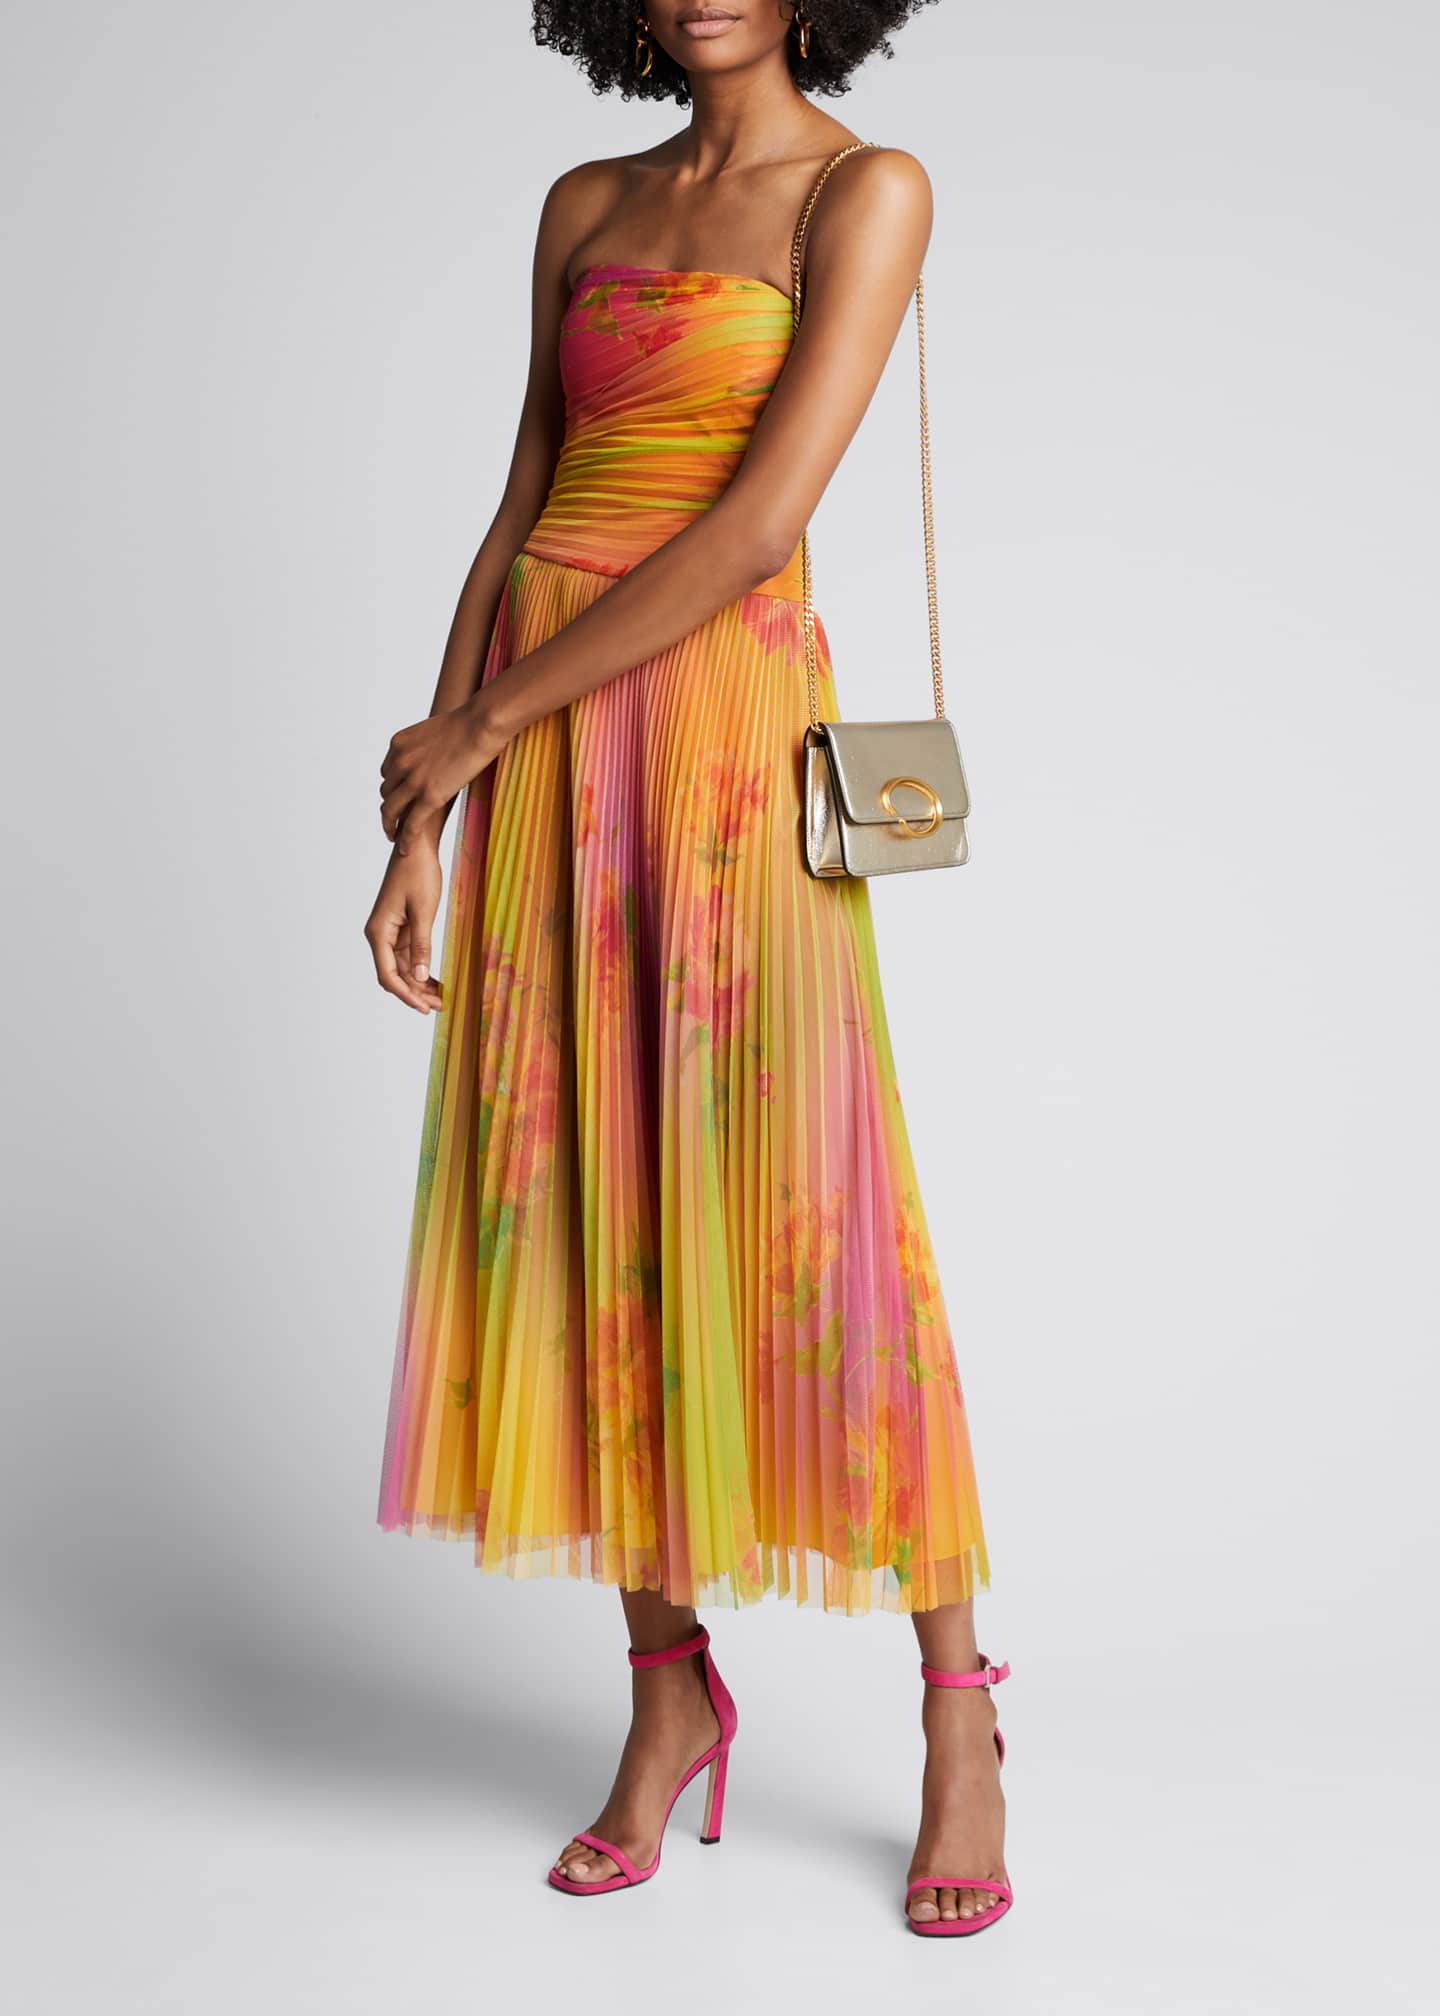 Ralph Lauren Collection Eloise Strapless Plisse Dress